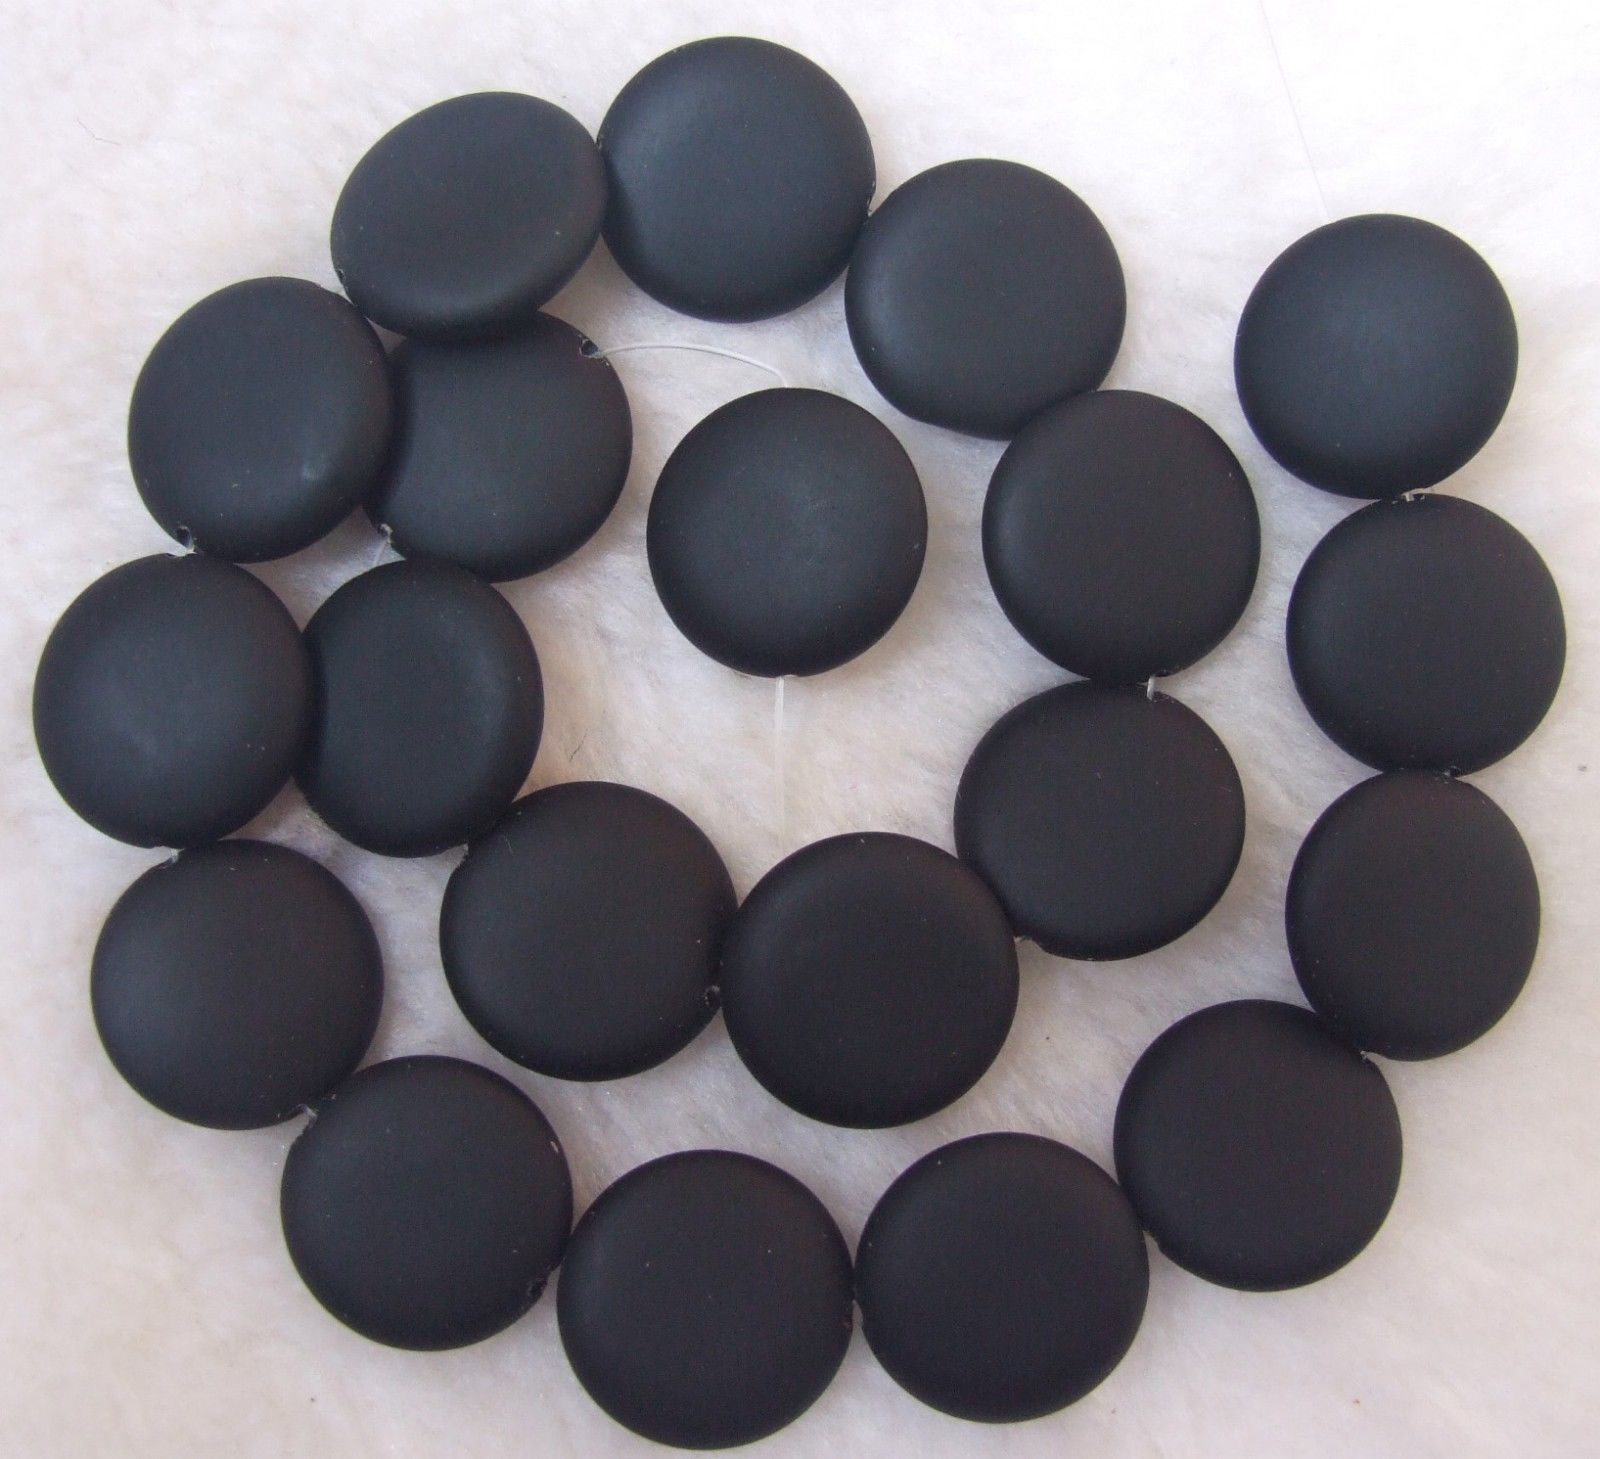 schwarz 1 Onyx 8mm Rund BOX 3 flach// black